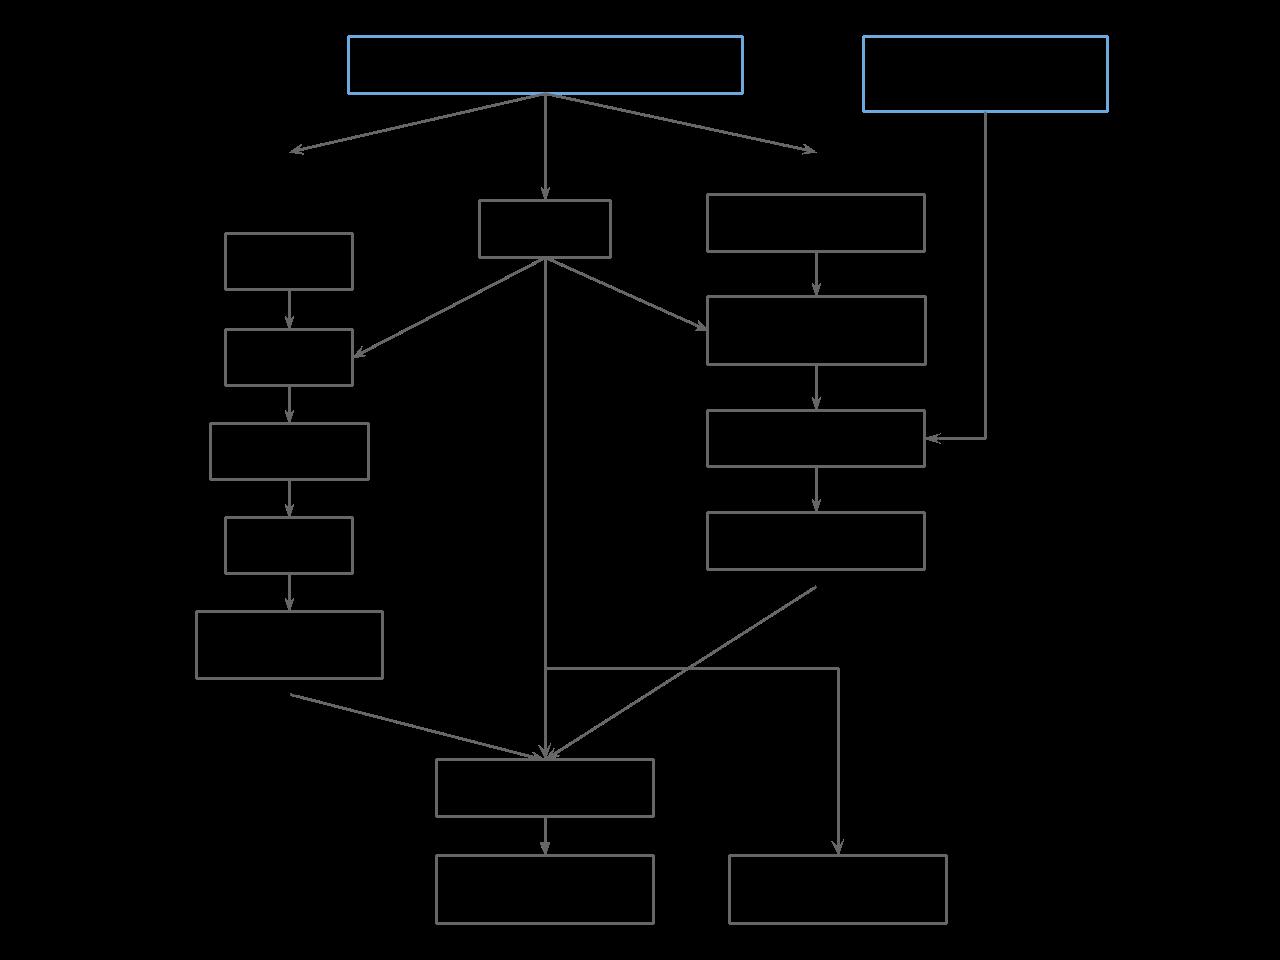 Components graph